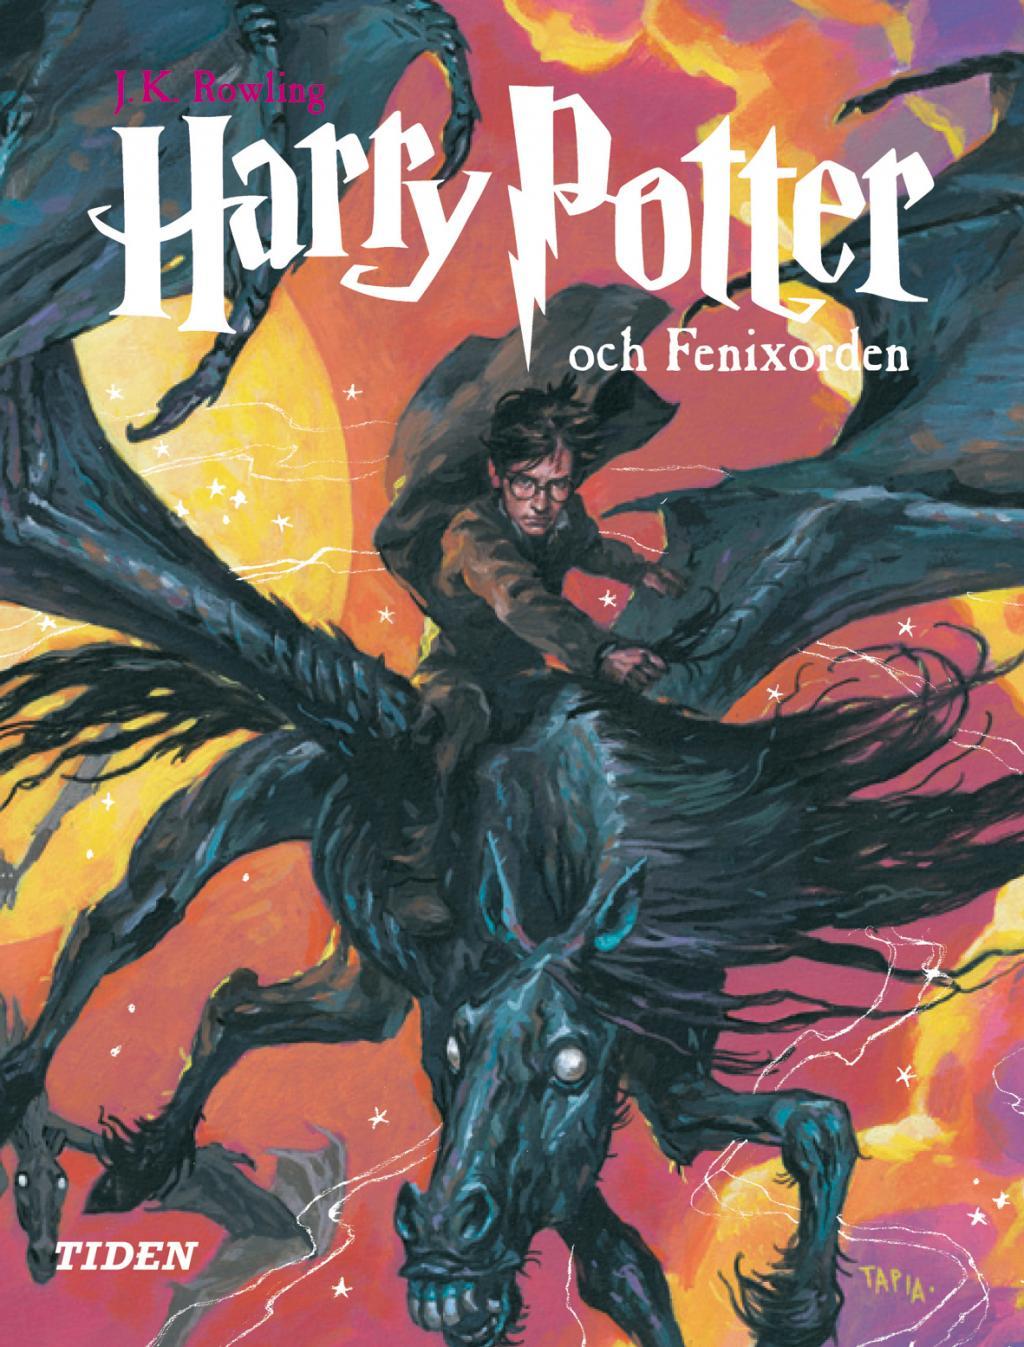 Harry Potter Book Covers Swedish ~ Harry potter och fenixorden av j k rowling kartonnage